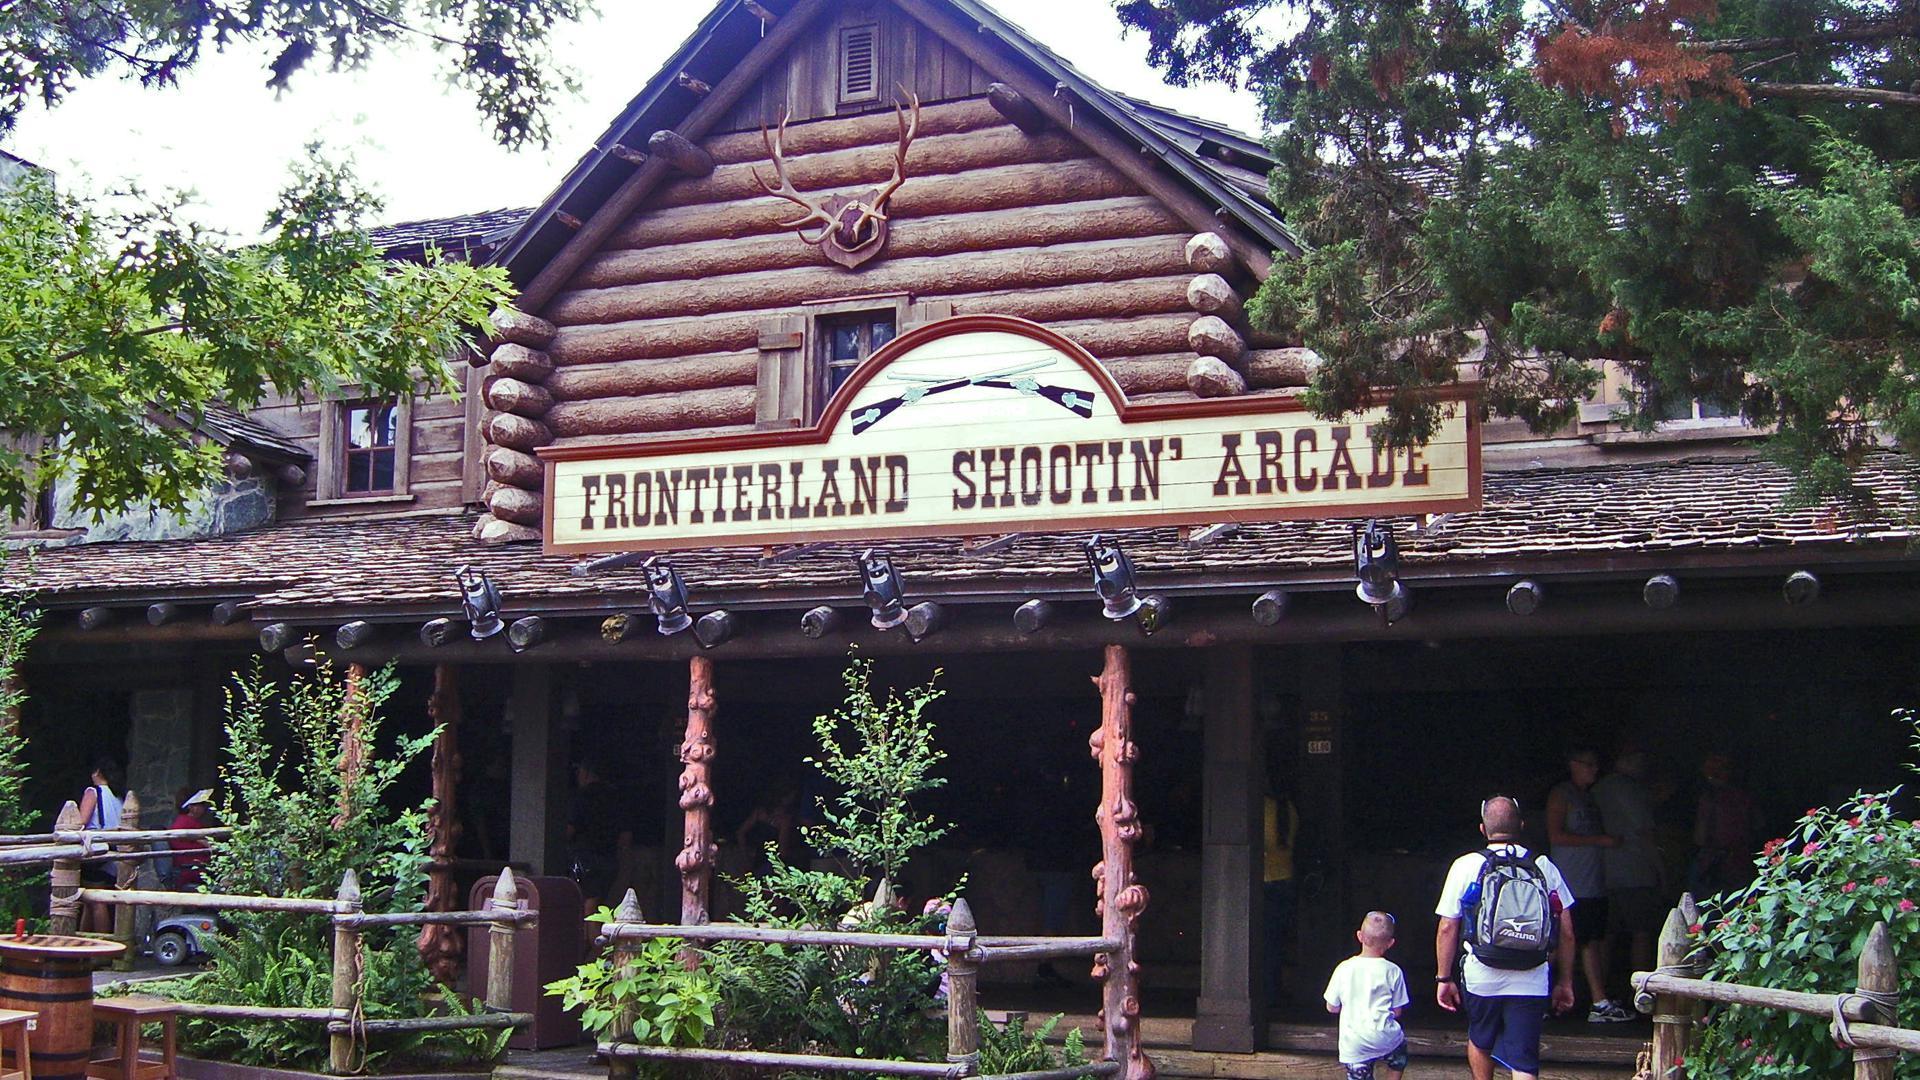 Universal Animal Wallpaper Frontierland Shootin Arcade Orlando Tickets Hotels